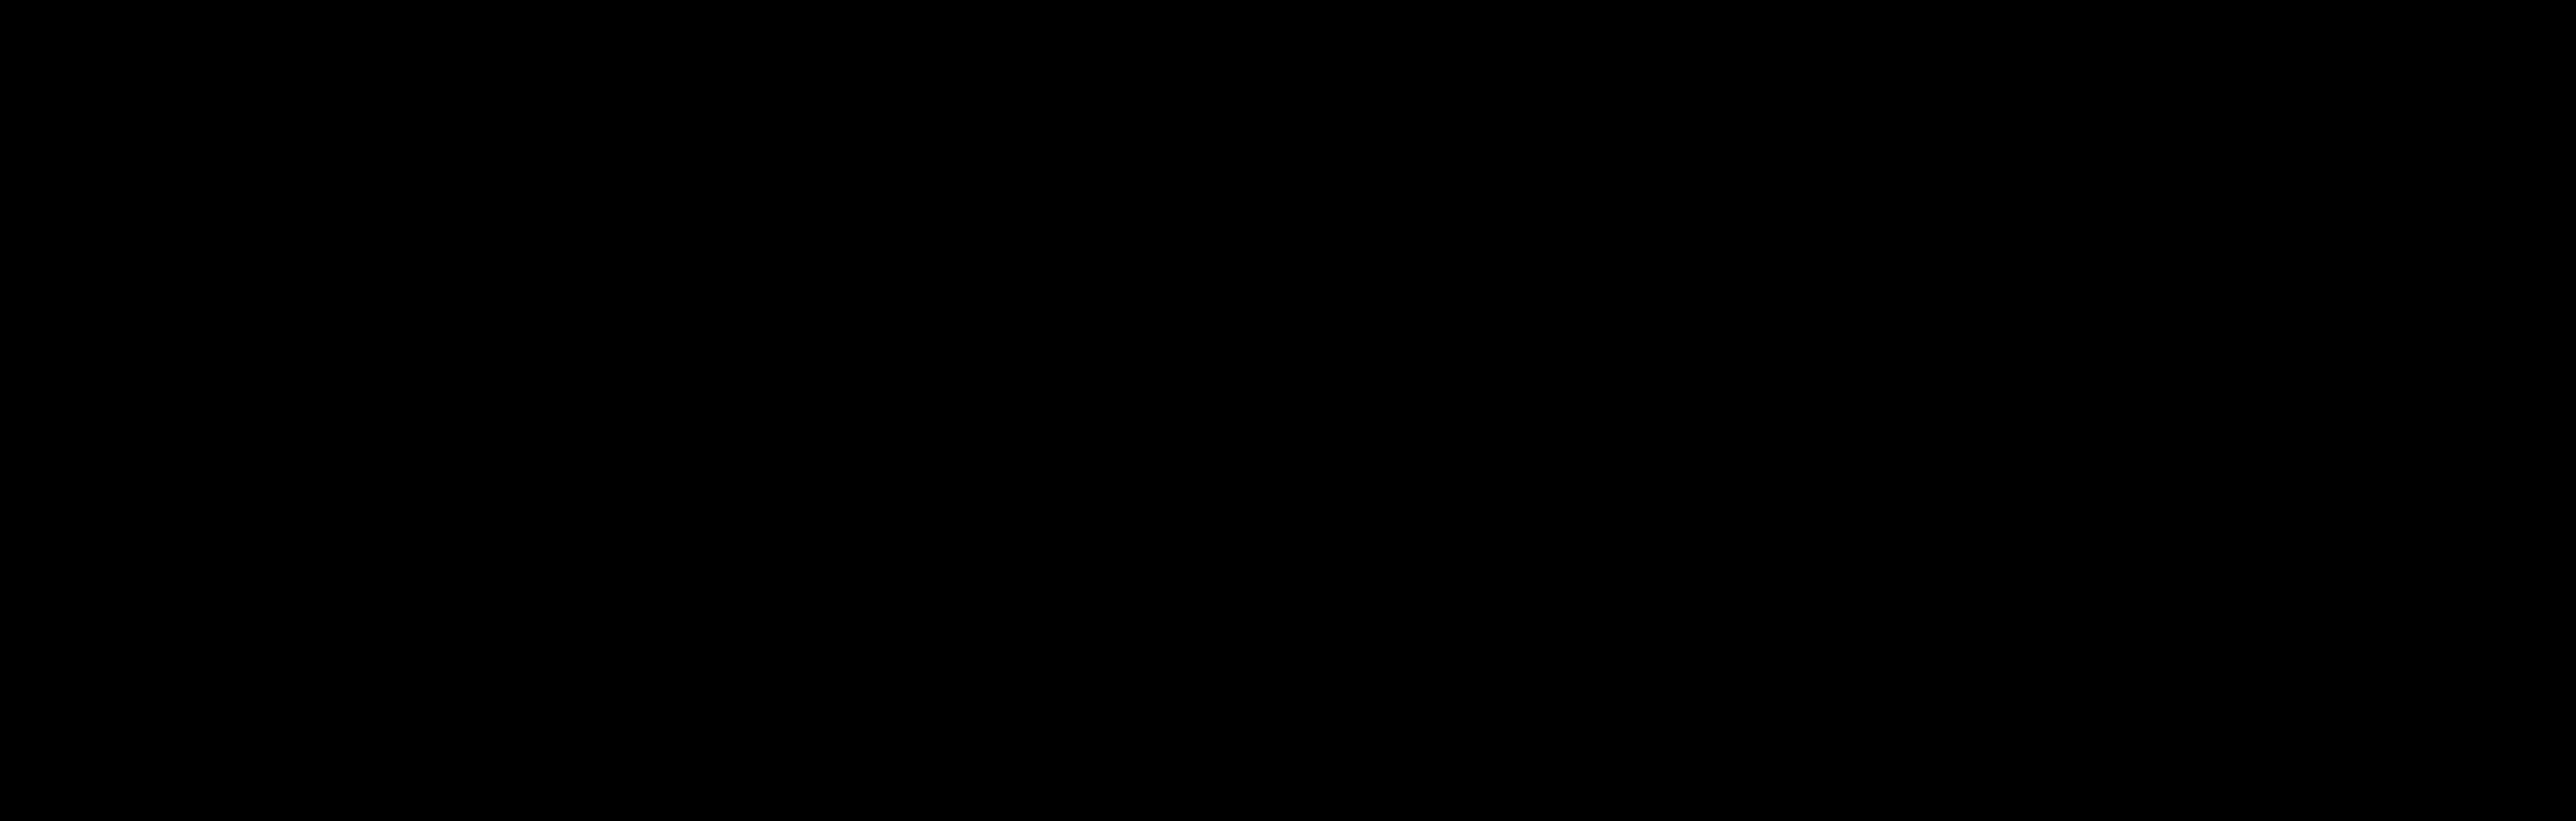 SET Dřez SCHOCK Formhaus D-100 Nero + baterie Cosmo Chrom 525001